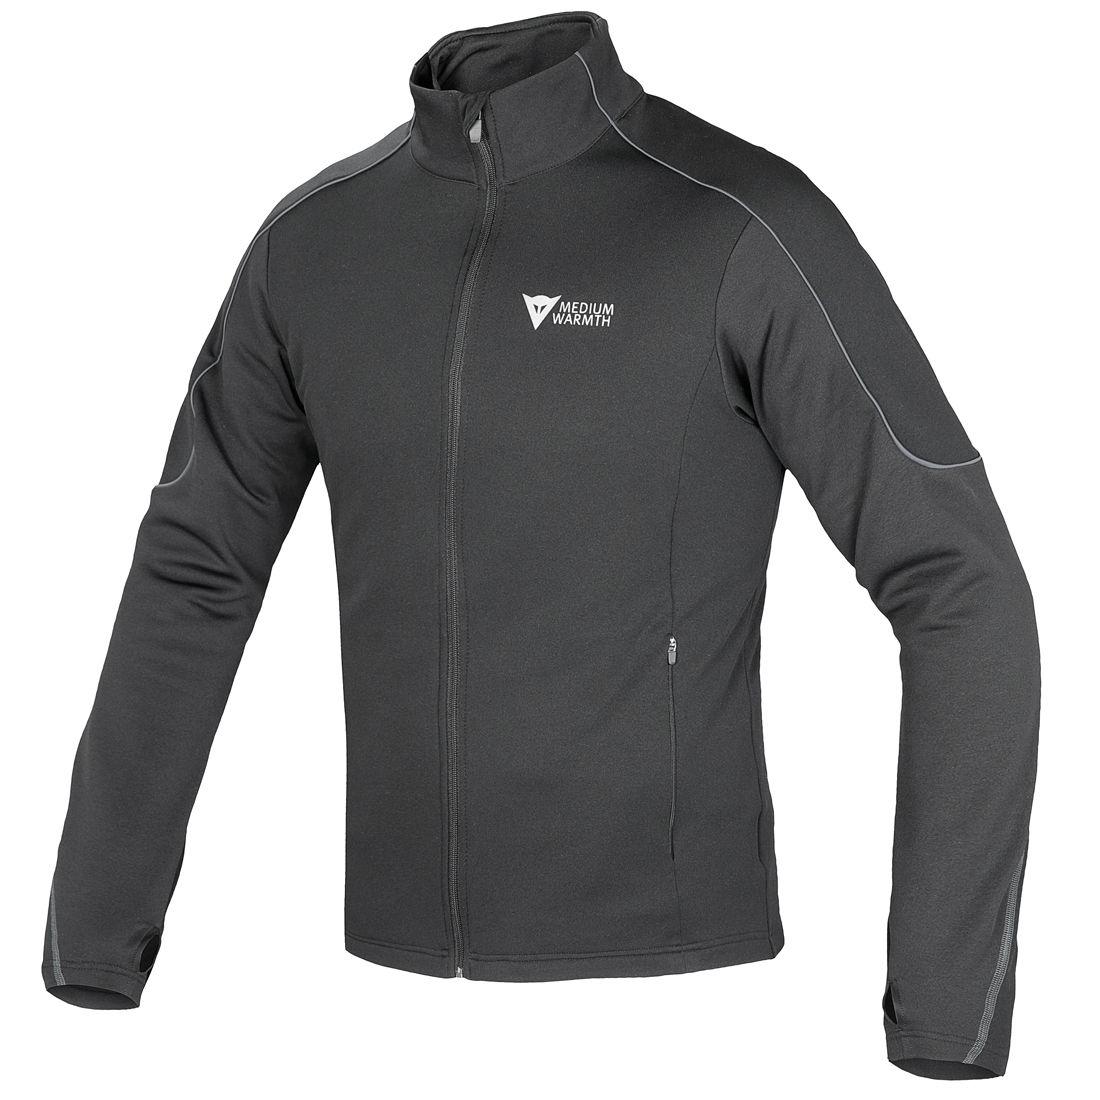 【DAINESE】D-MANTLE FLEECE 防風保暖內層(穿)外套 - 「Webike-摩托百貨」